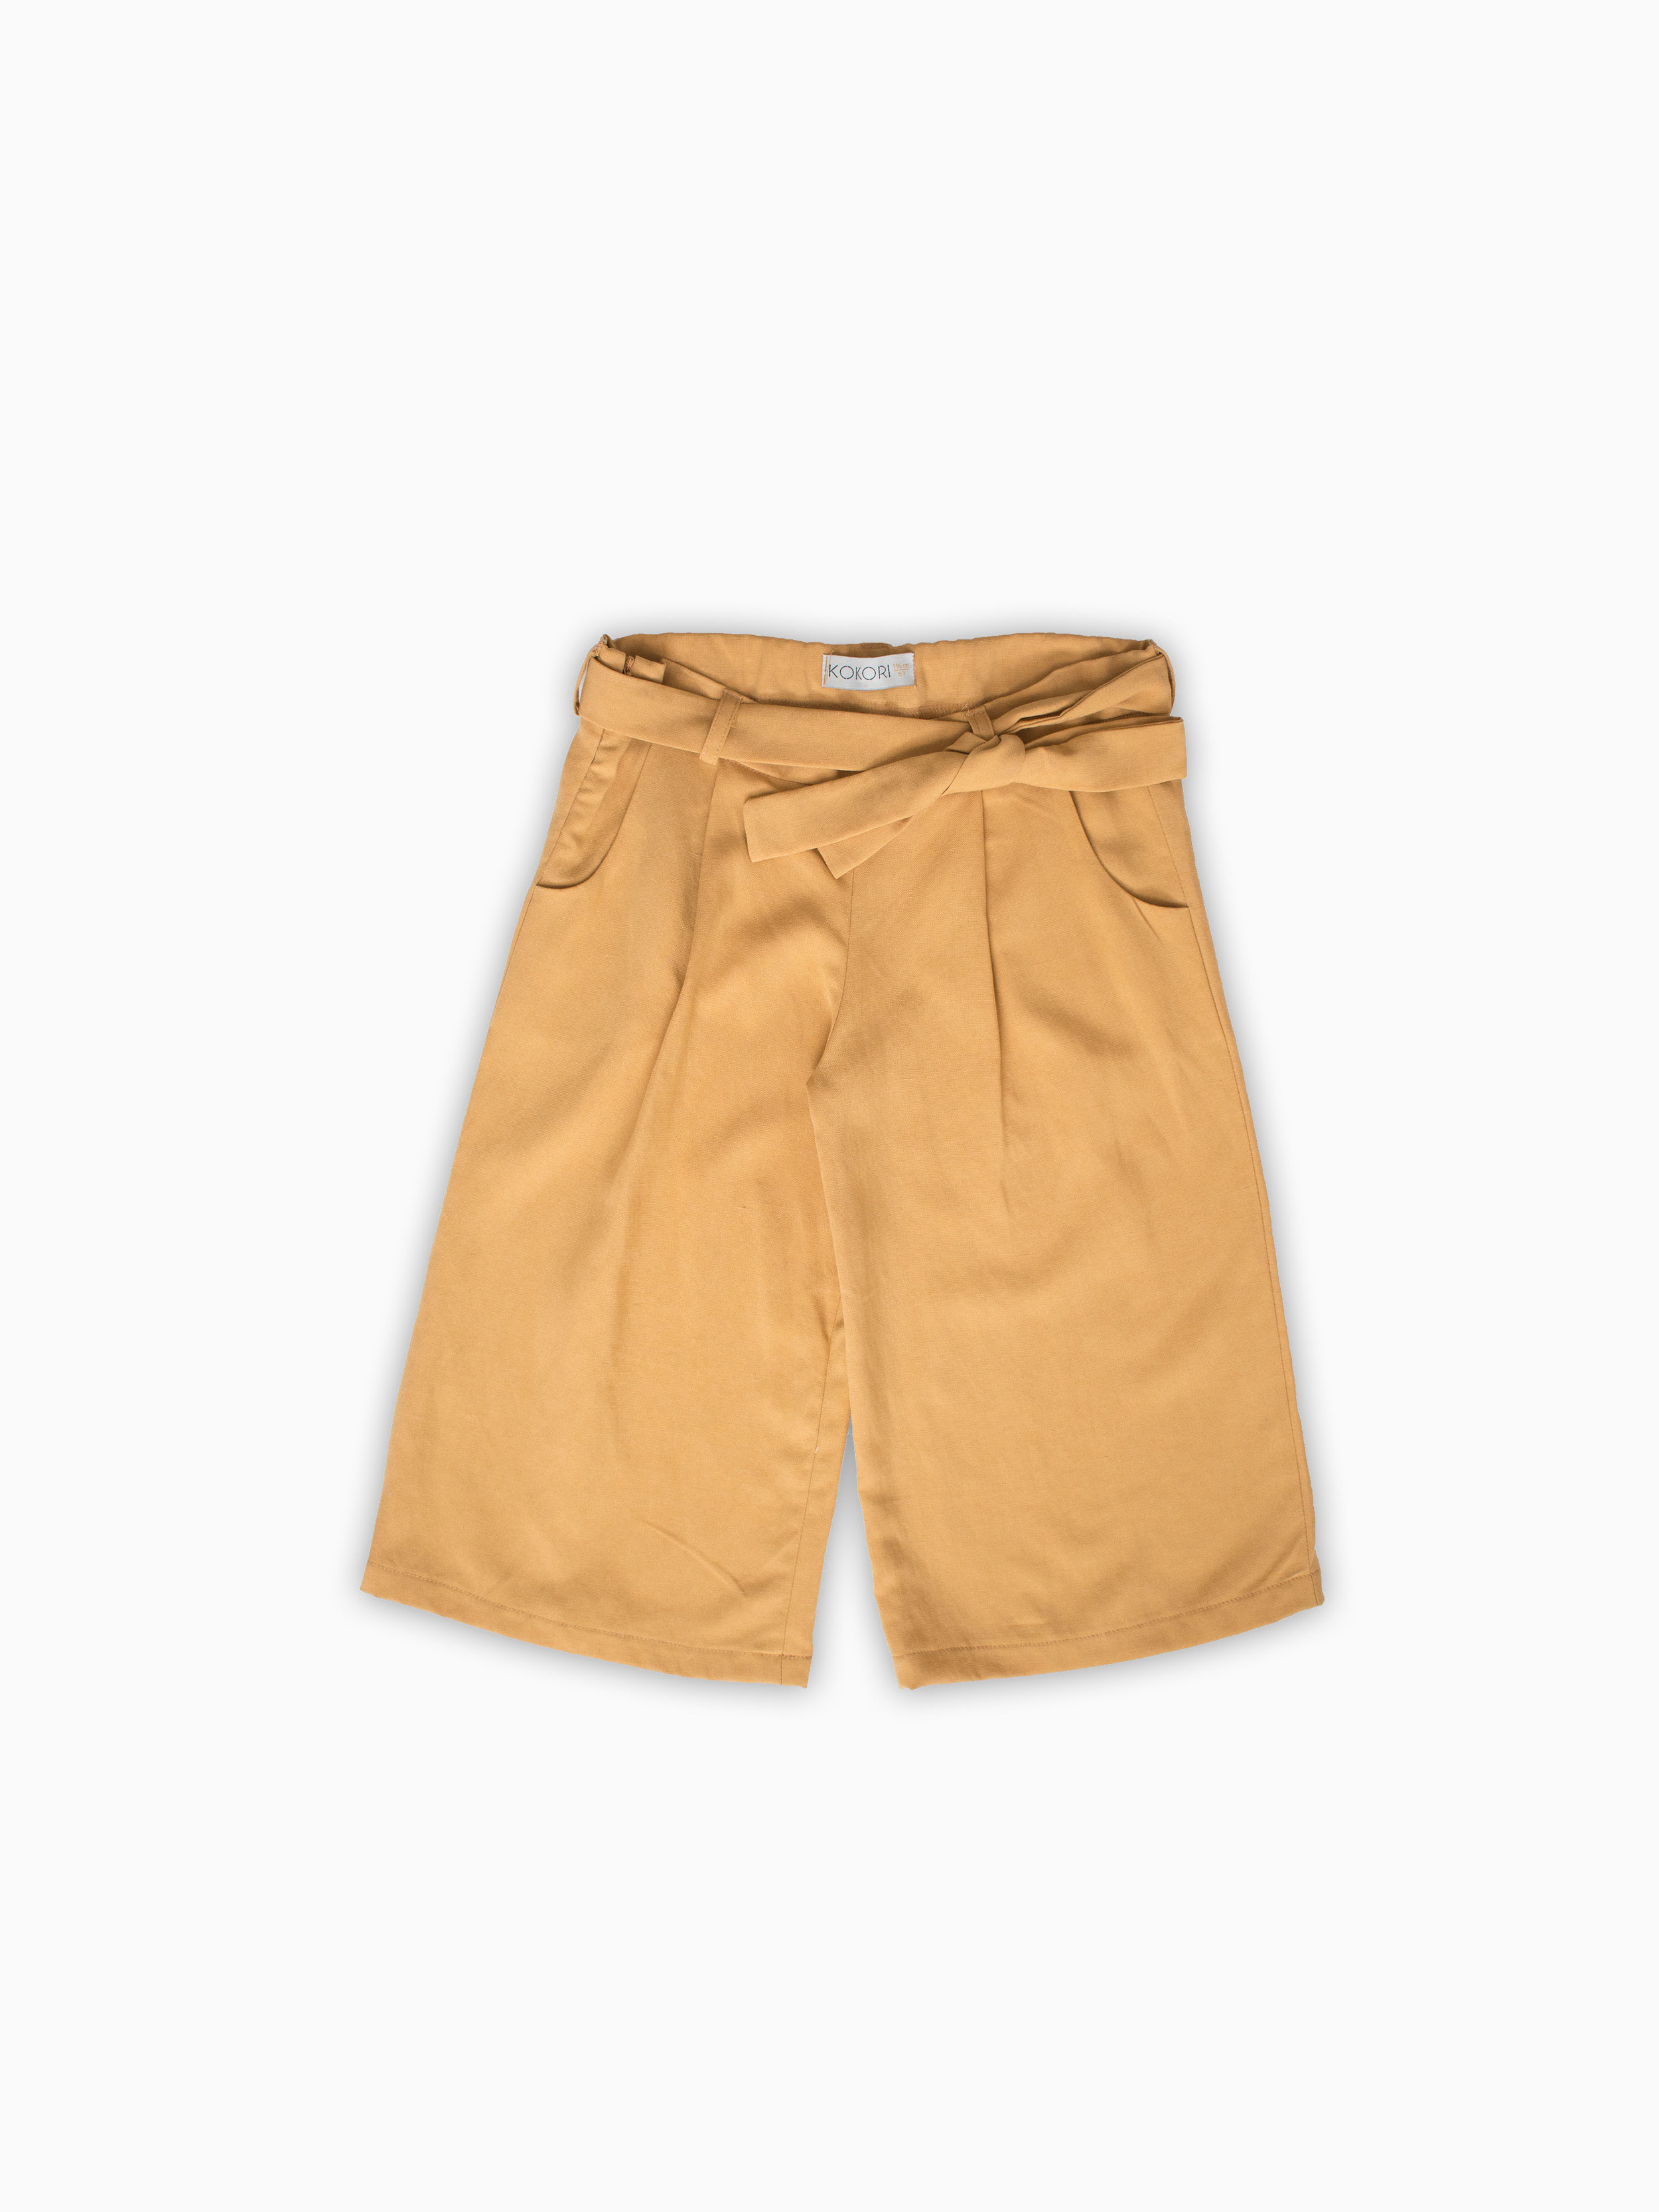 wales trouser